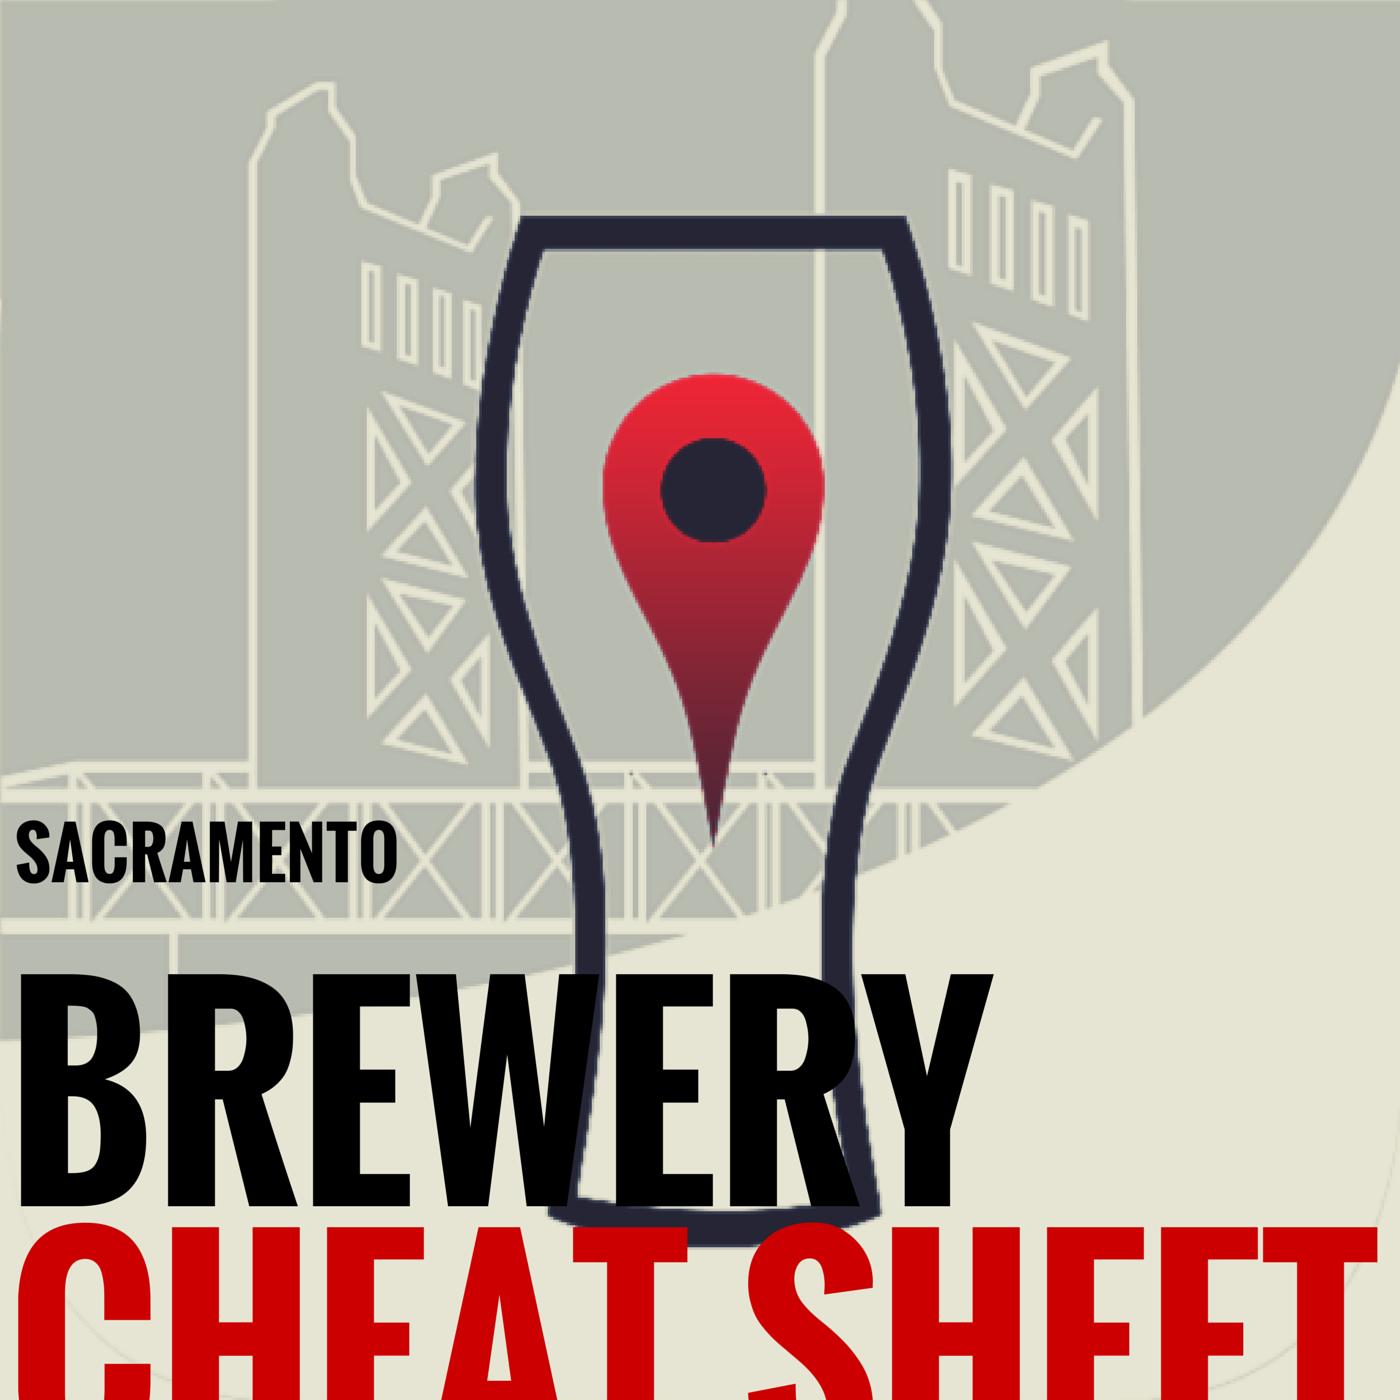 cheat sheet image.png